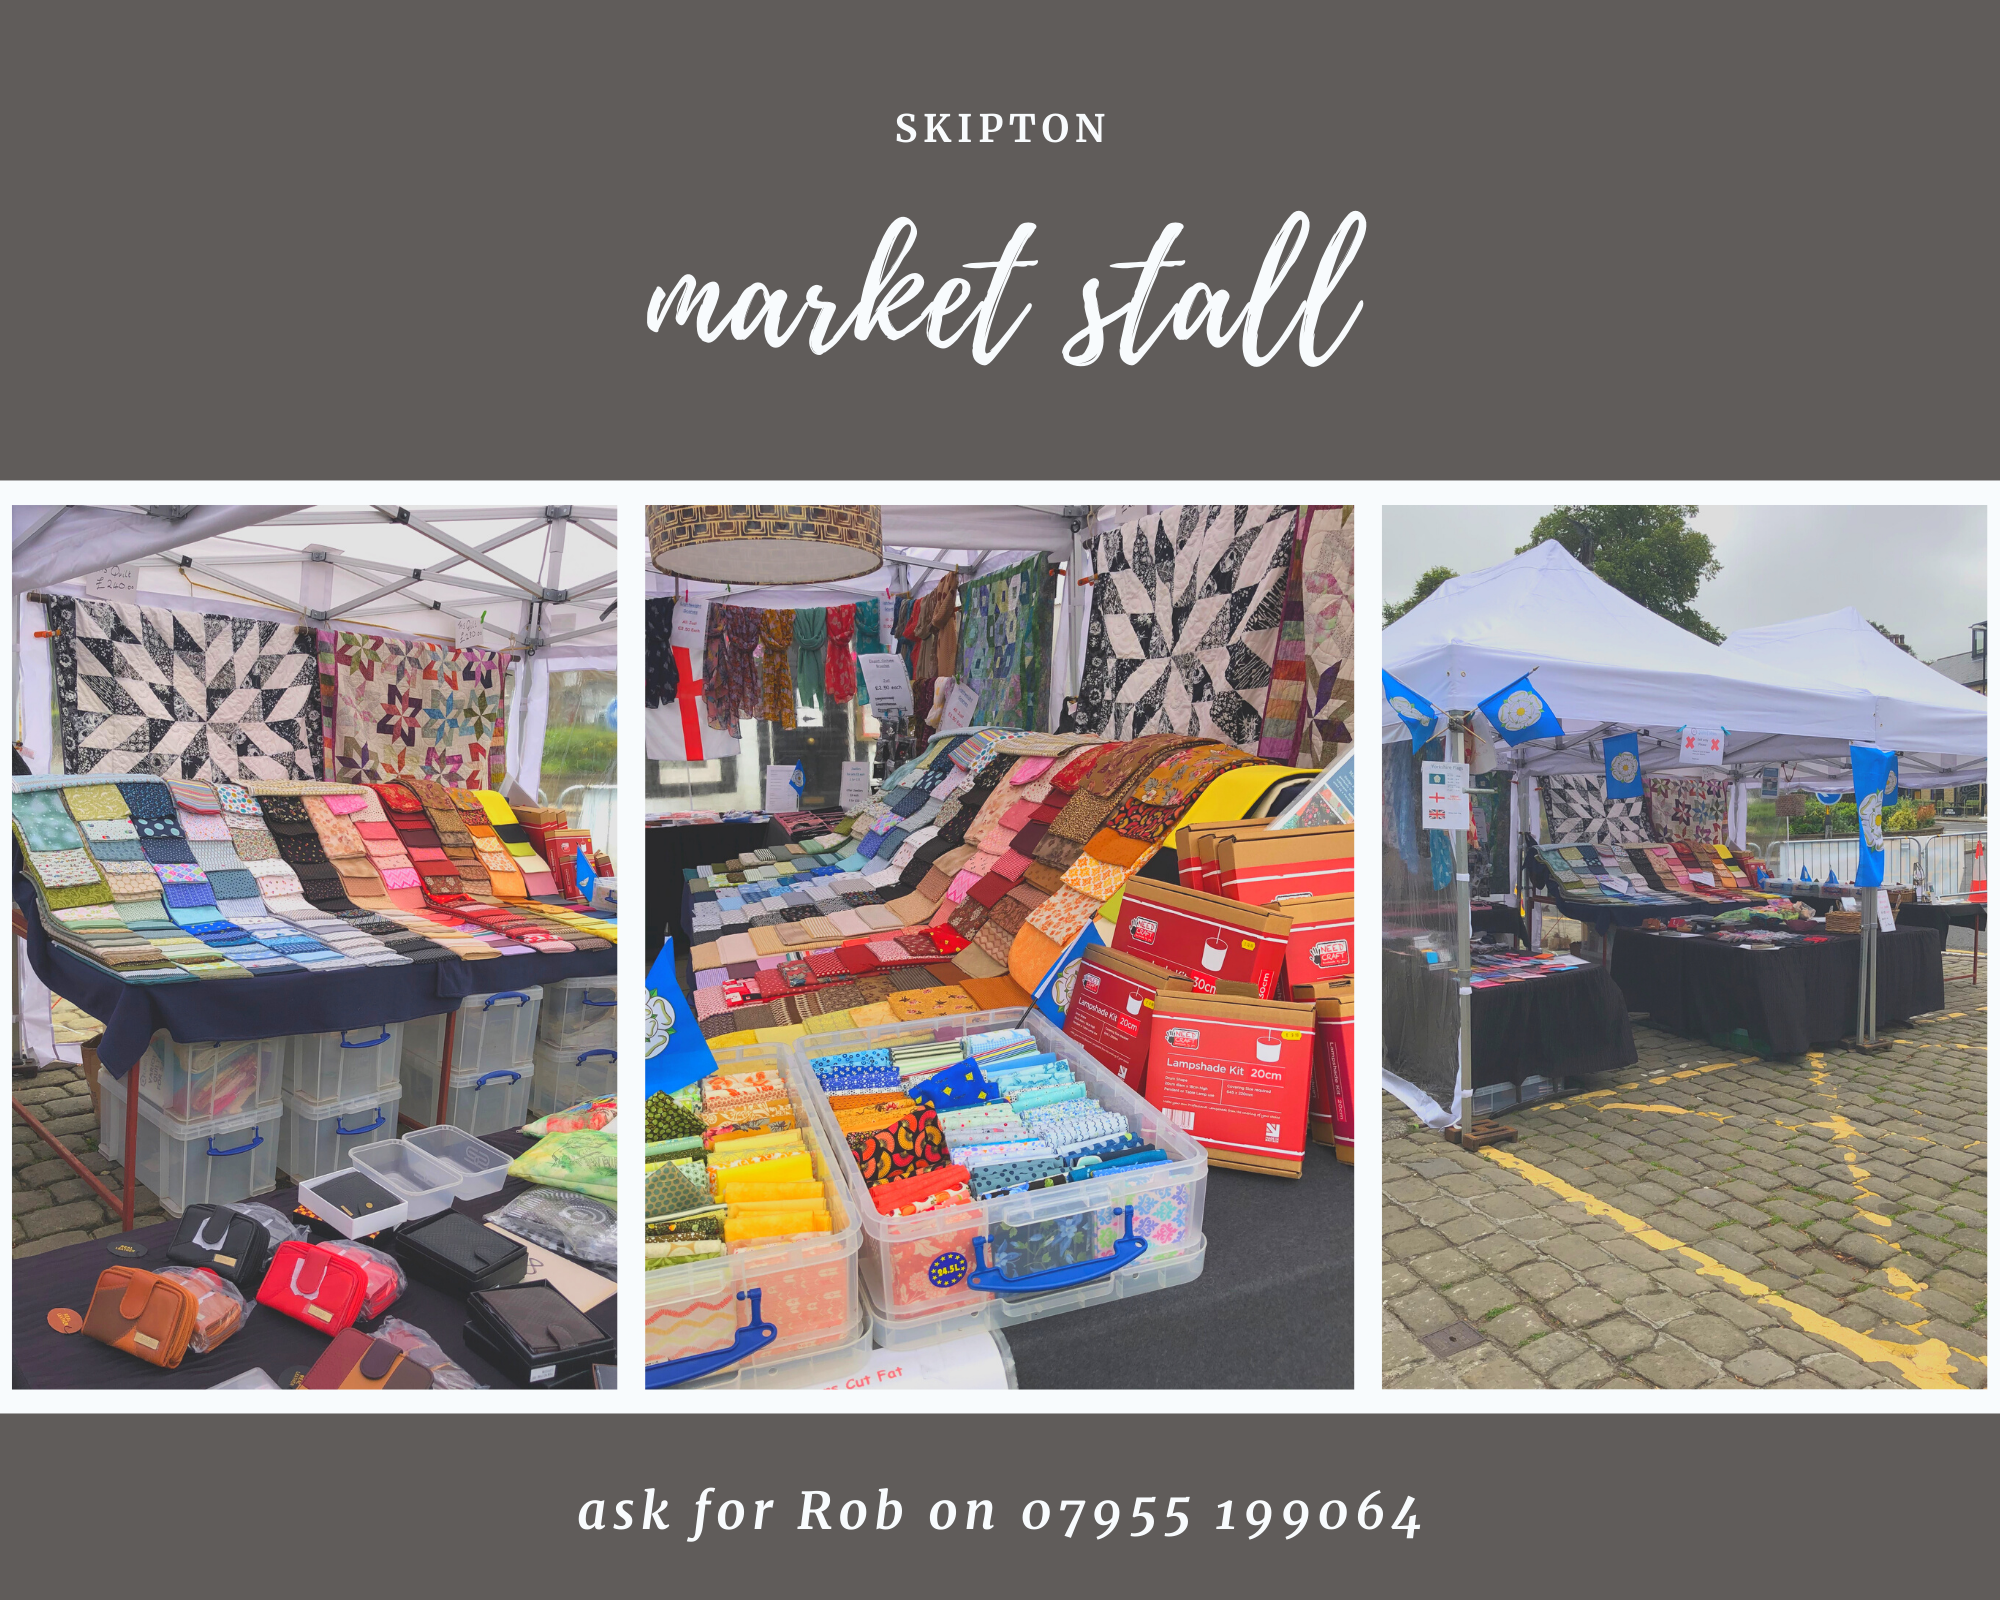 Skipton market stall in North Yorkshire